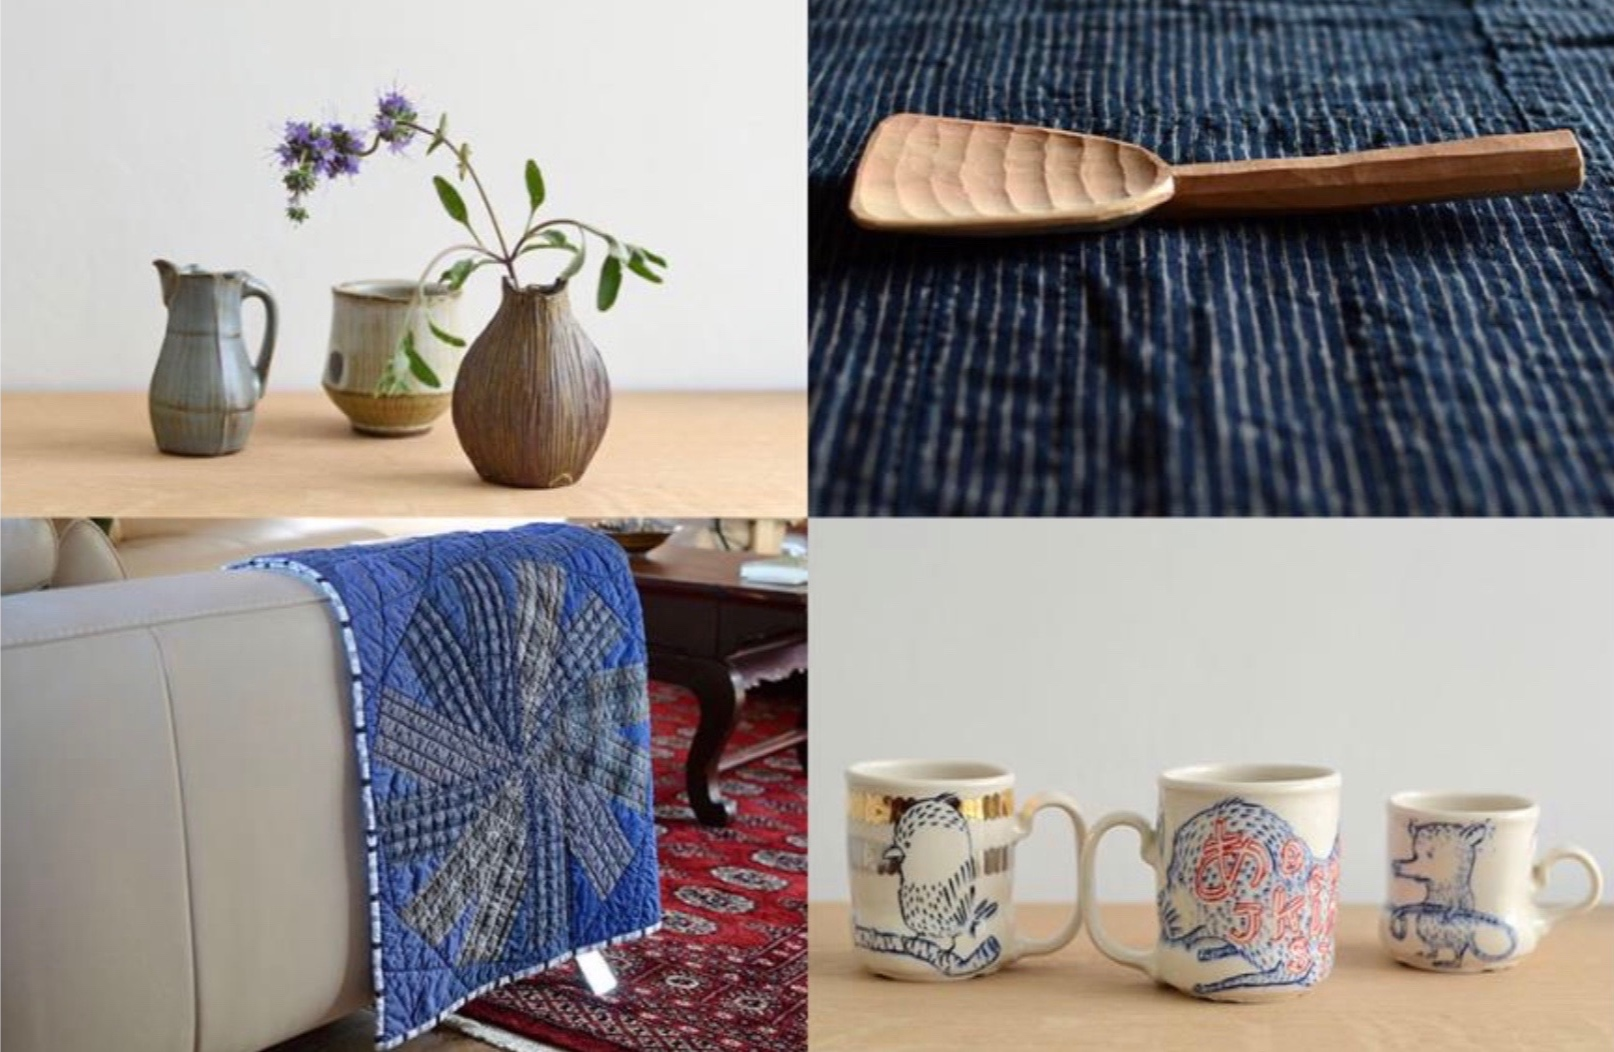 Top Left: Steven Rolf (ceramics); Top Right: Jarrod Dahl (woodwork) Lower Left: Sarah Nishiura (quilt); Lower Right: Ayumi Horie (ceramics)